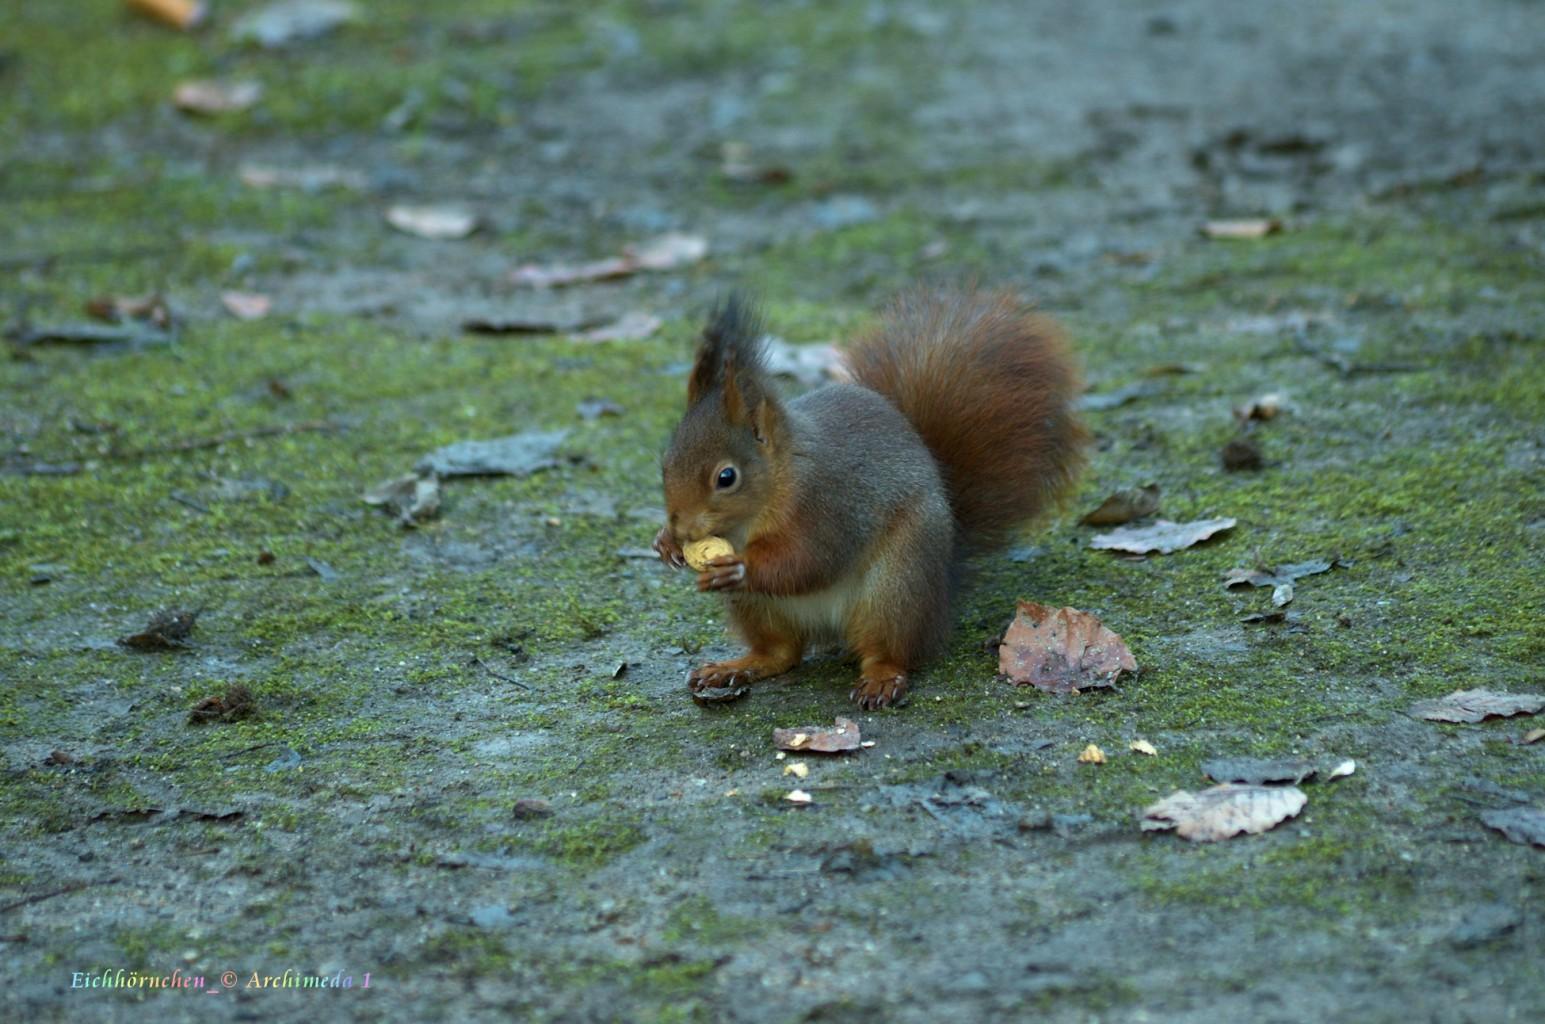 Eichhörnchen_© Archimeda 1_3